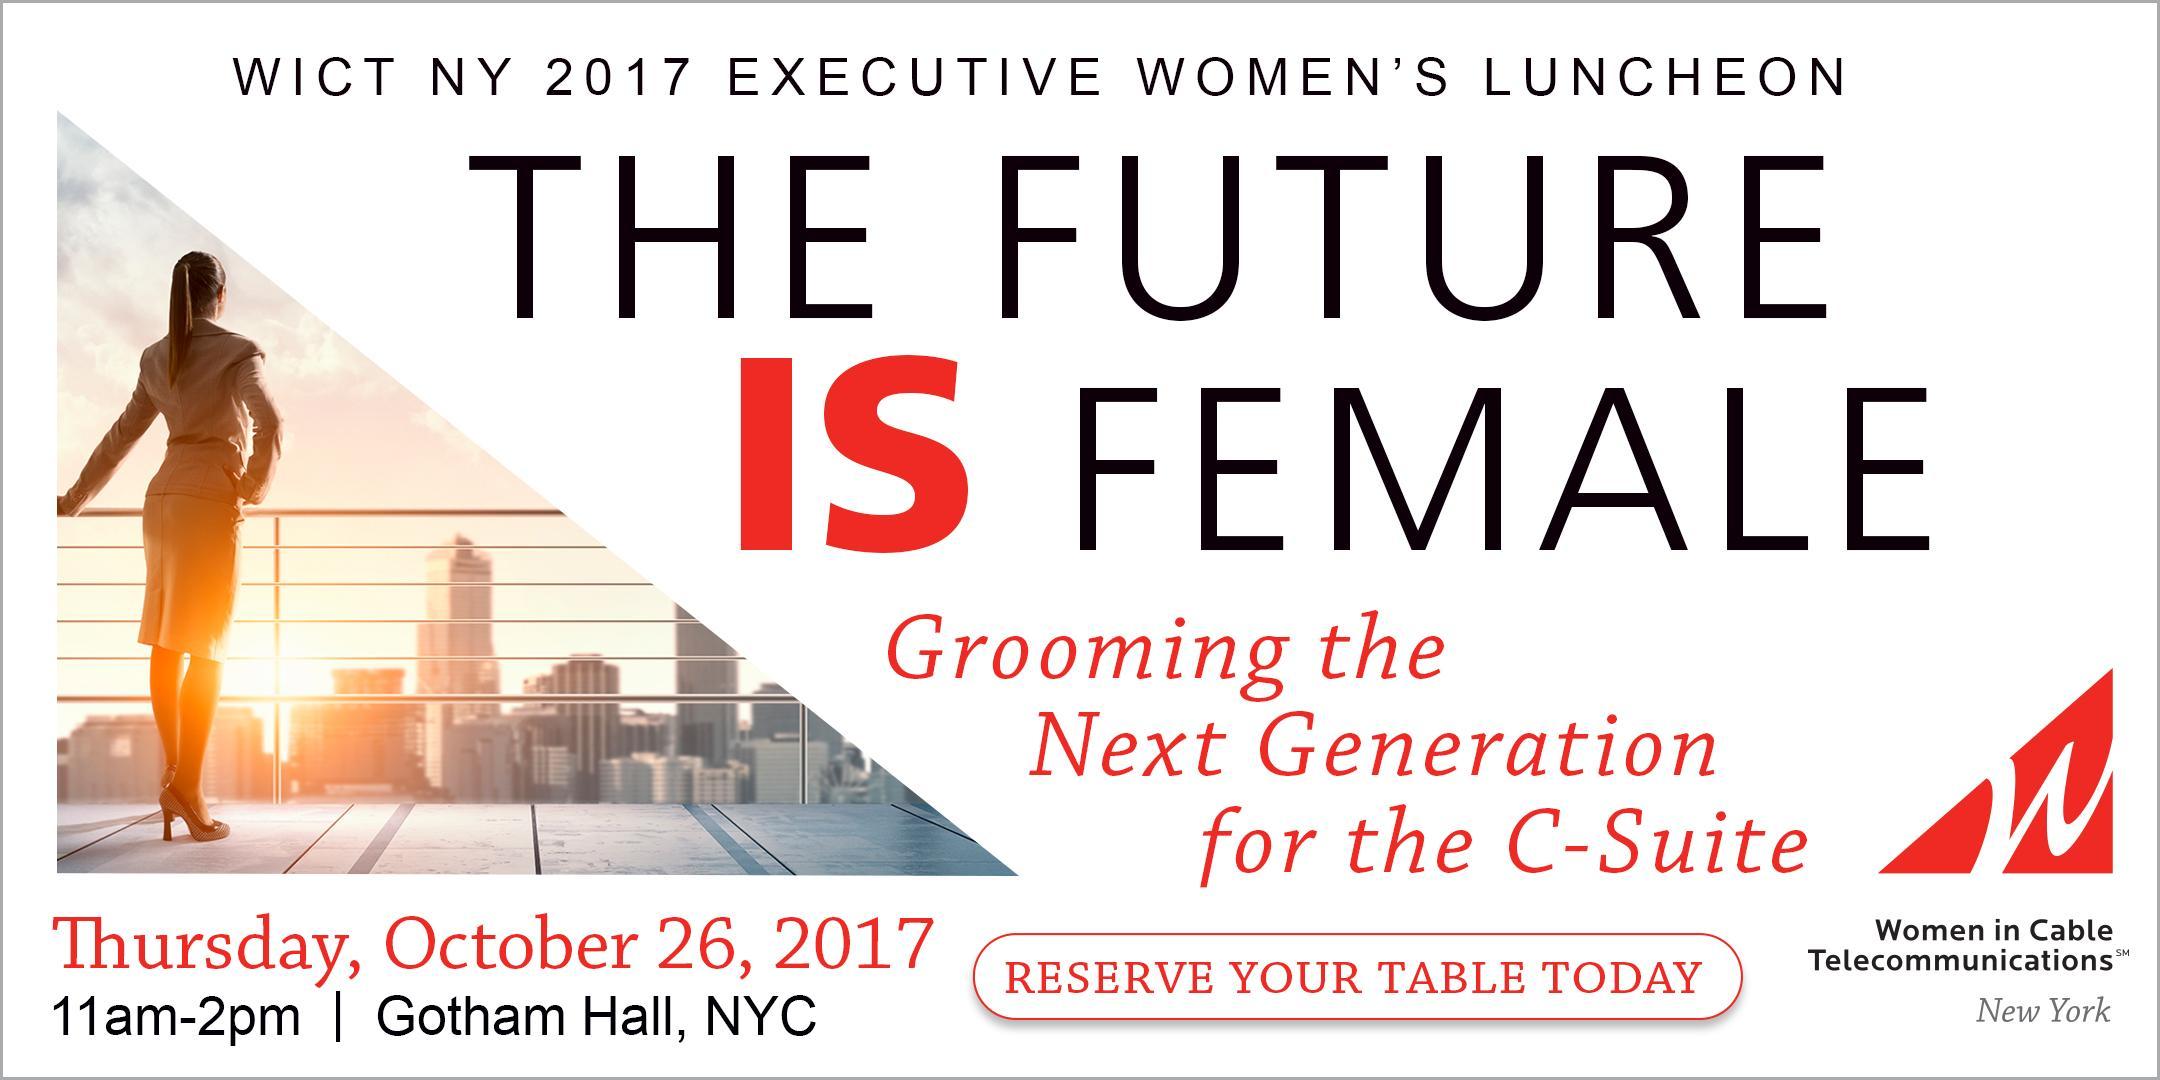 2017 Executive Women's Luncheon